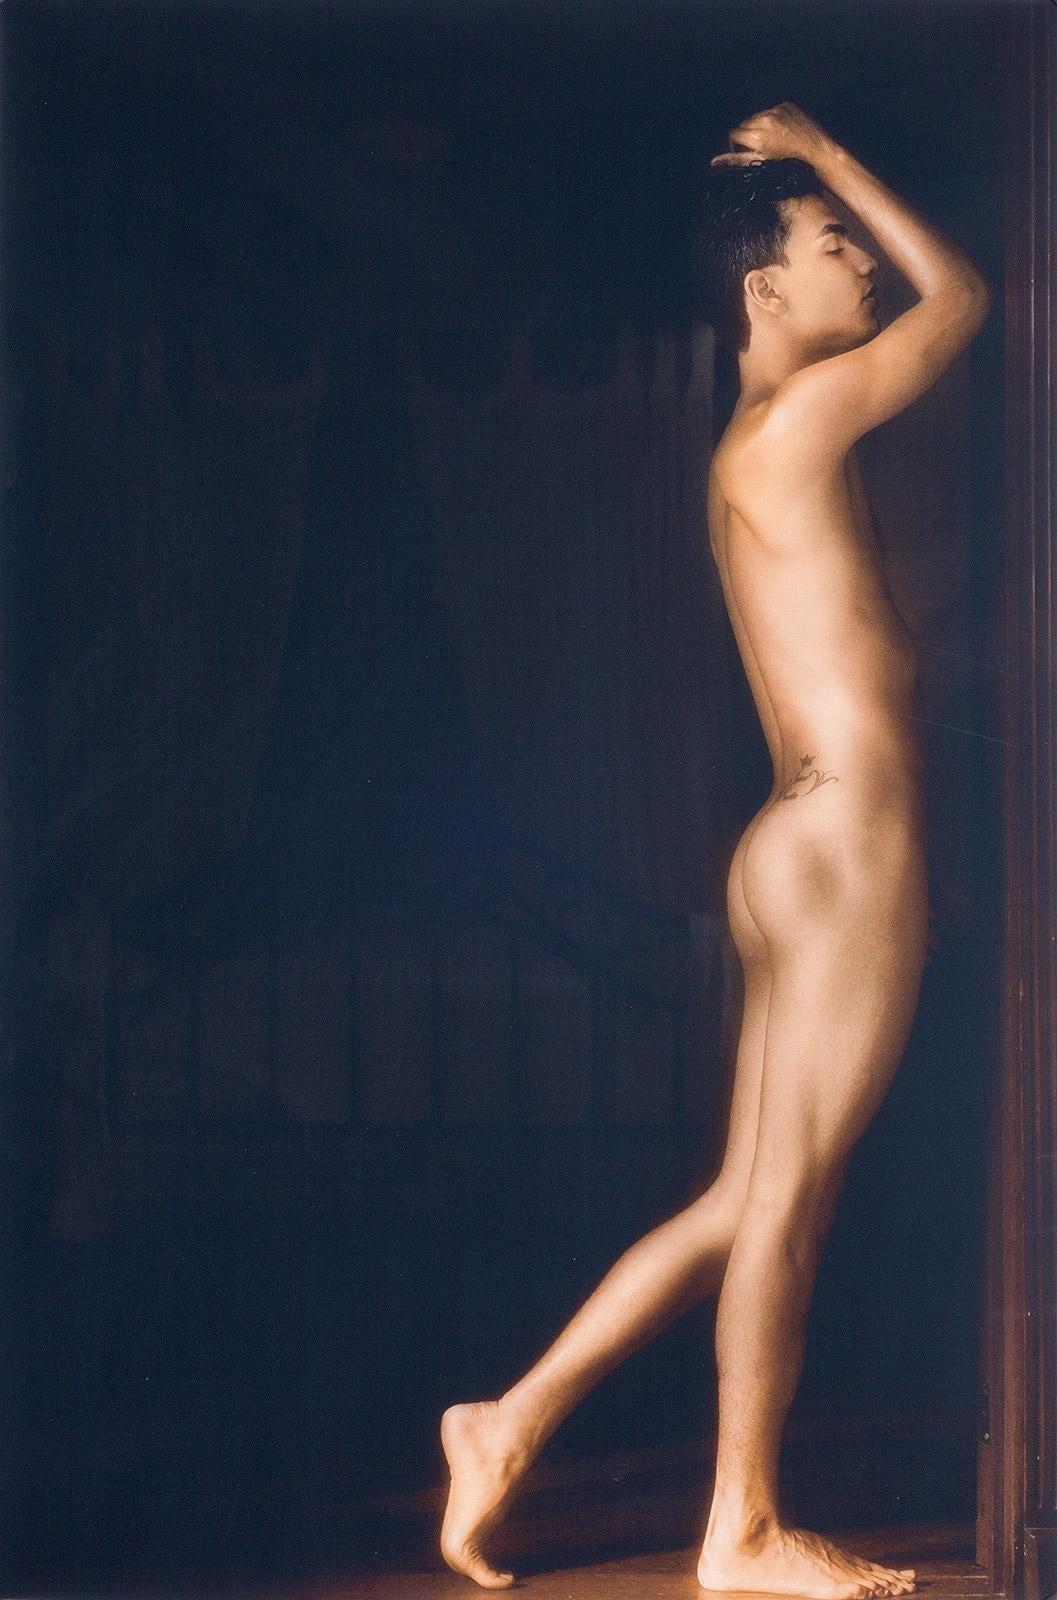 Lisa ann hardcore nude